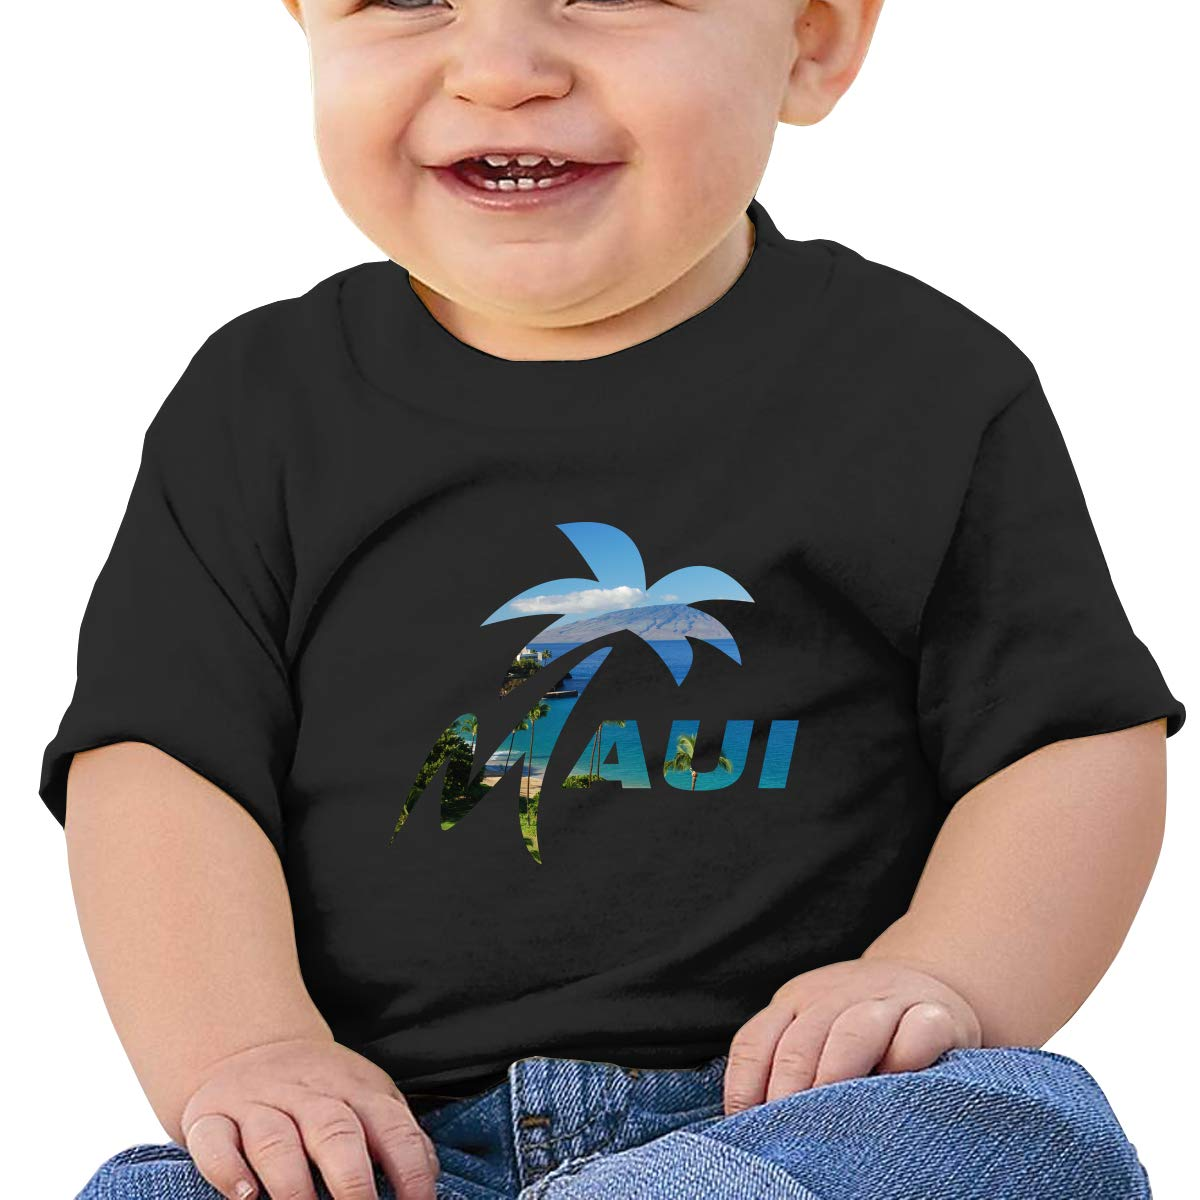 5husihai Patron Tequila Logo 1-24 Months Boy Girl Baby Short Sleeve Creeper Jumpsuit Black